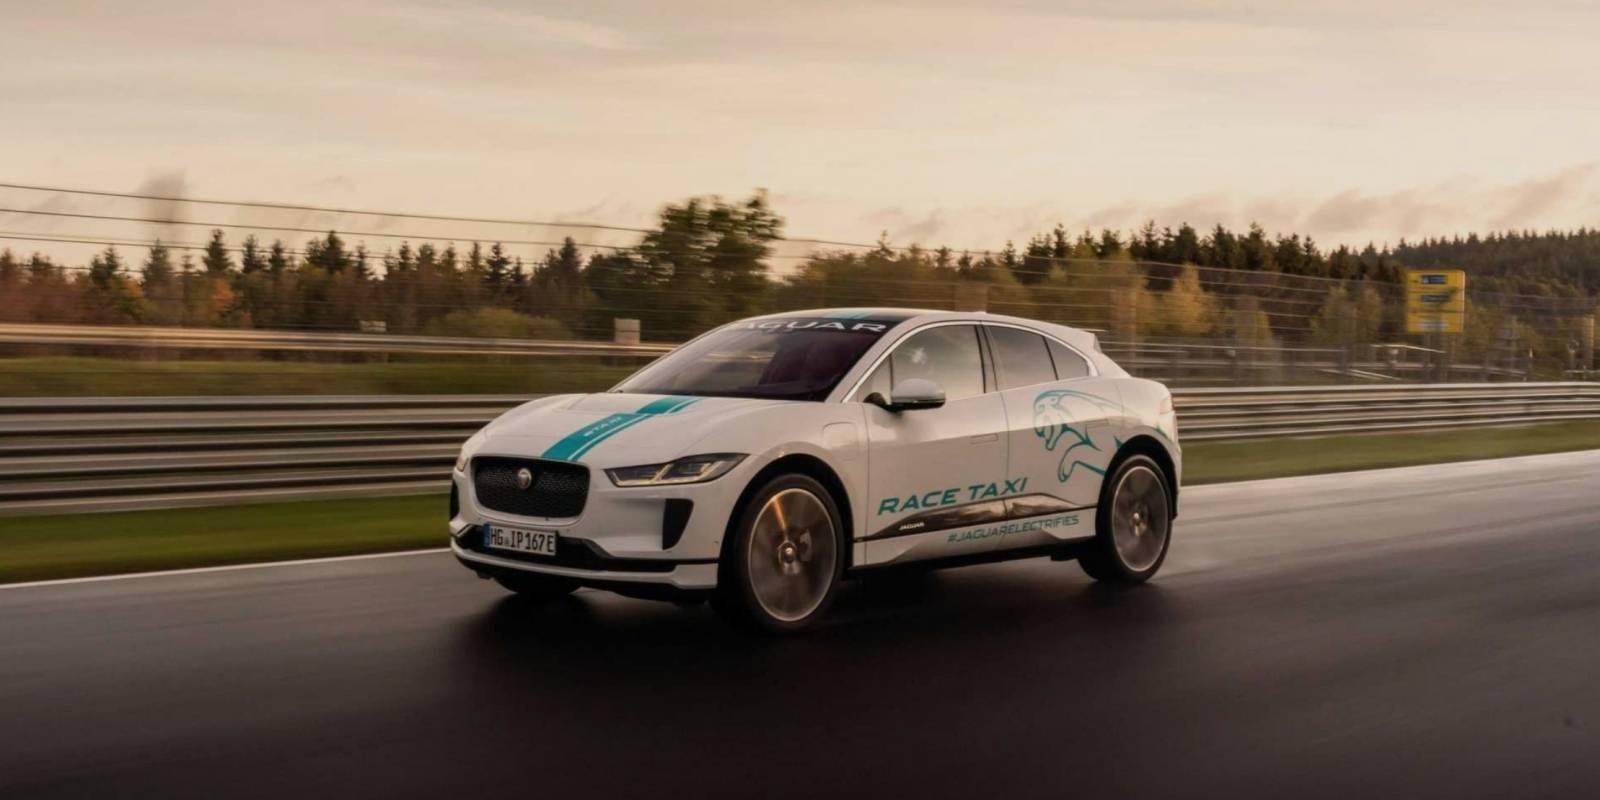 Jaguar Race eTaxi en pista